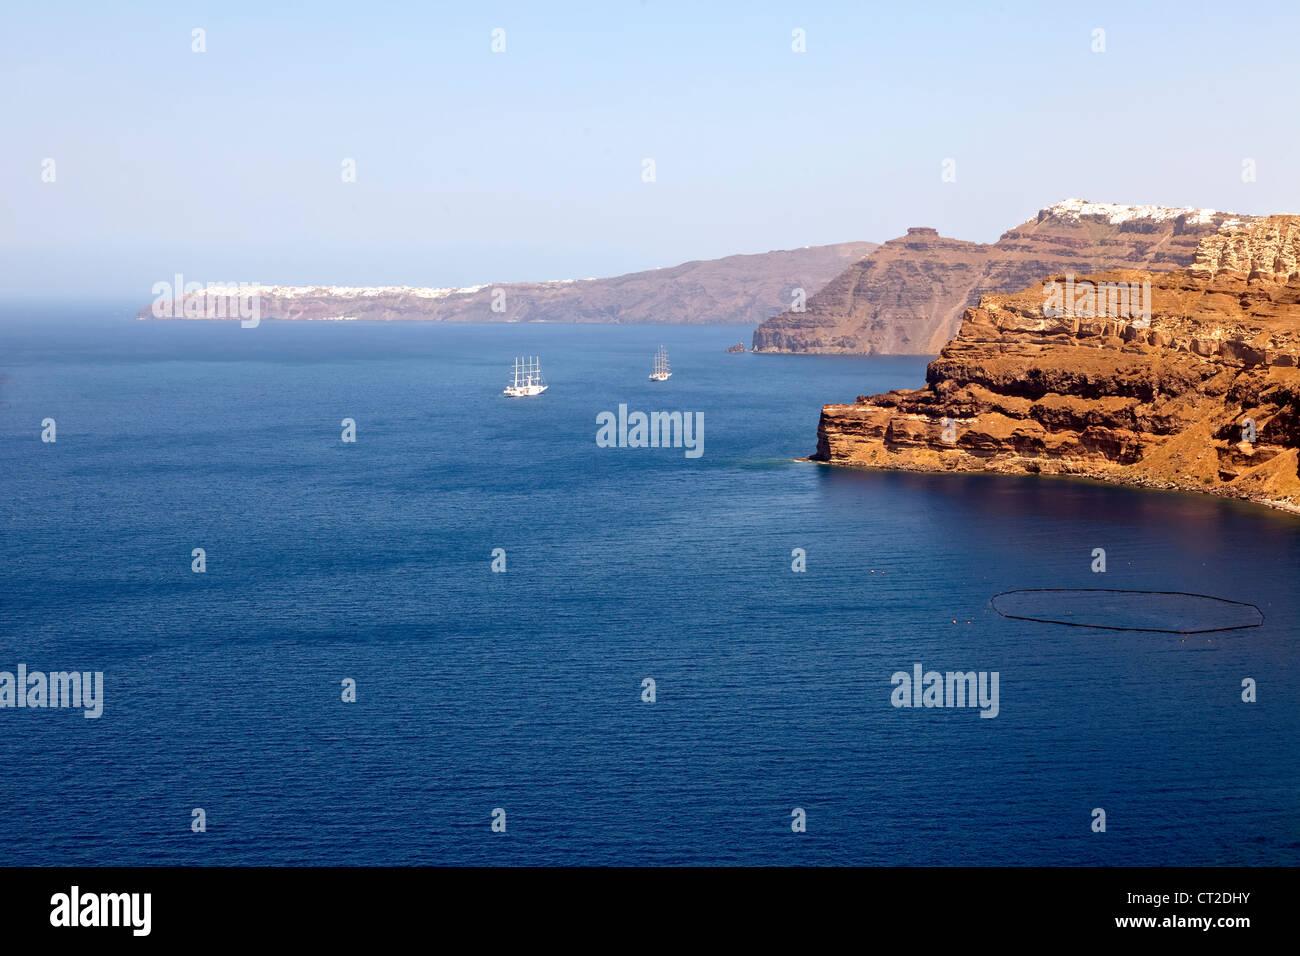 Panorama, Caldera, Santorini, Grecia Imagen De Stock